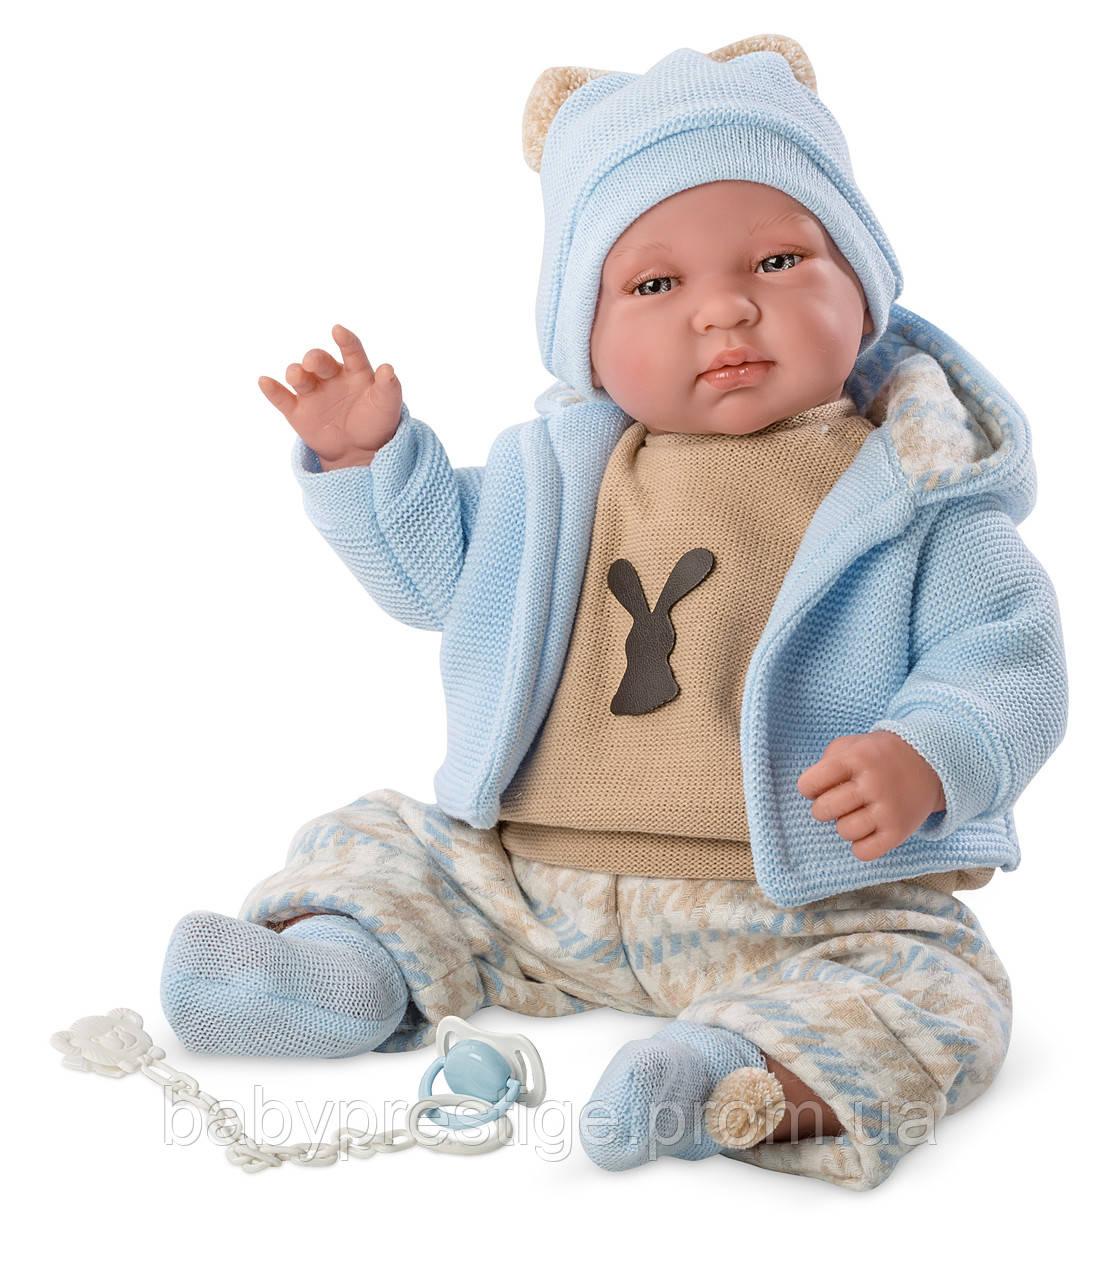 Llorens - кукла младенец мальчик Nacido, 44 см